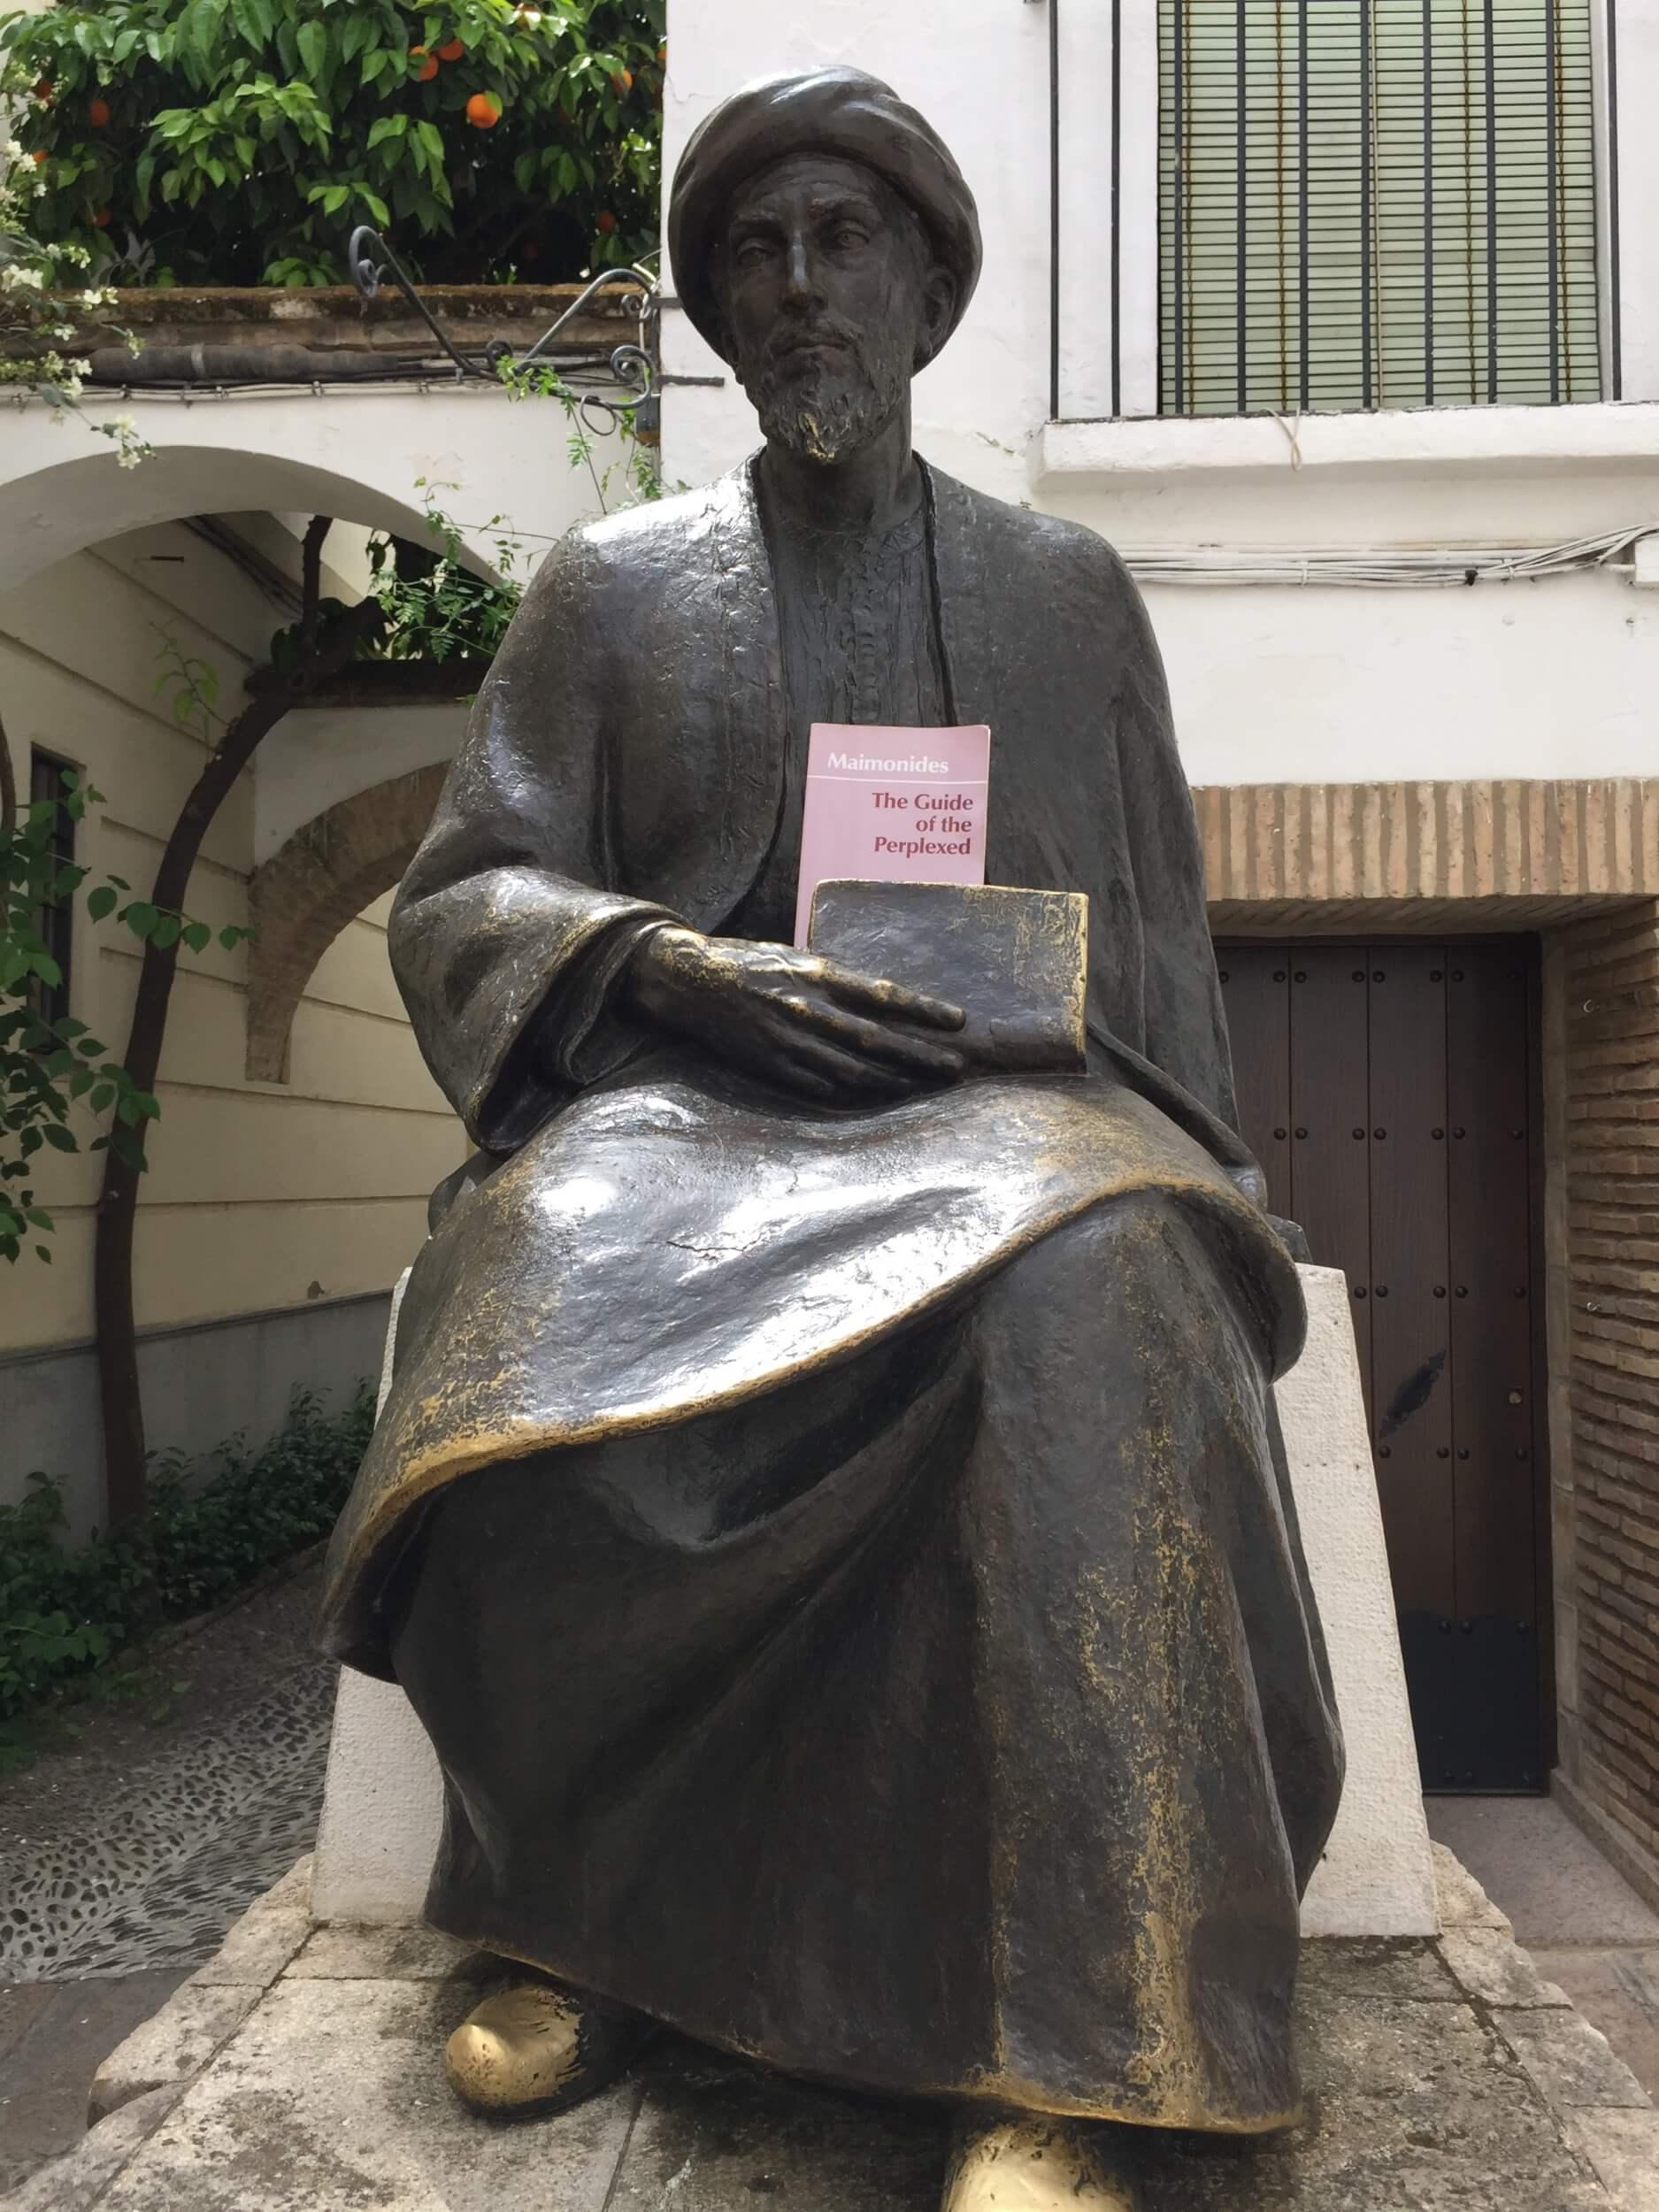 Maimonides in Cordoba. (Photo: Max Blumenthal)